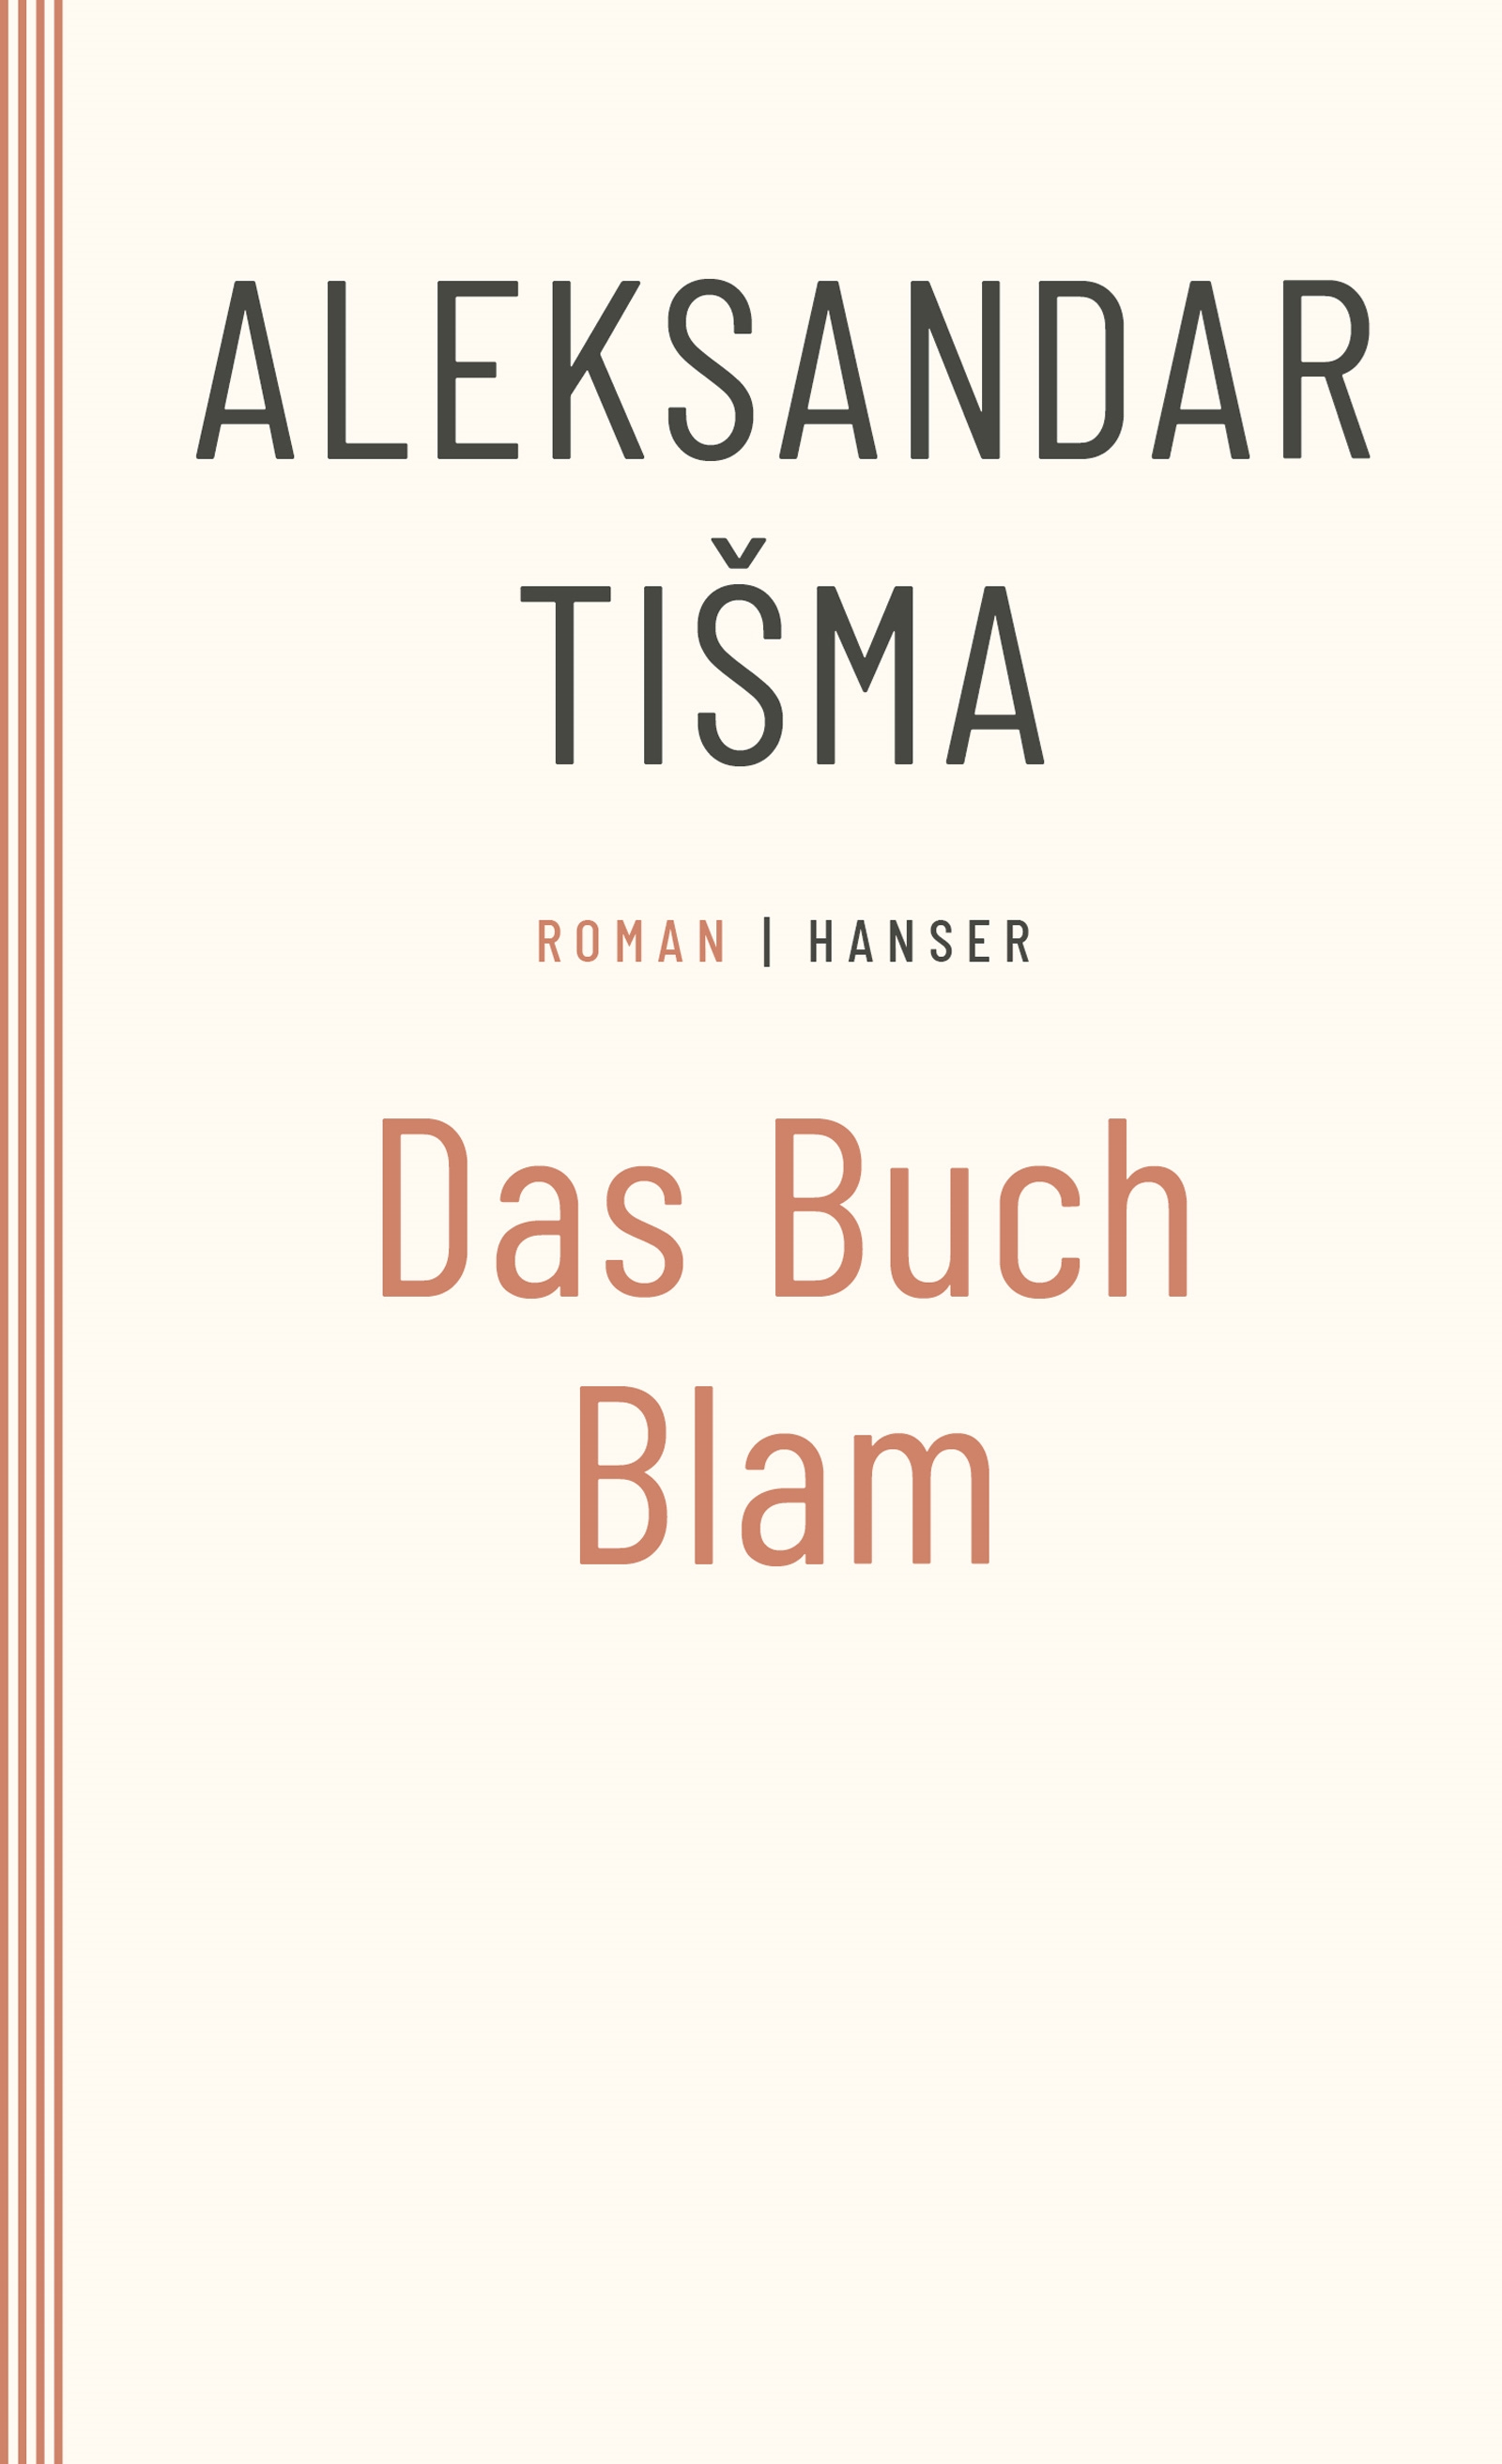 Das Buch Blam